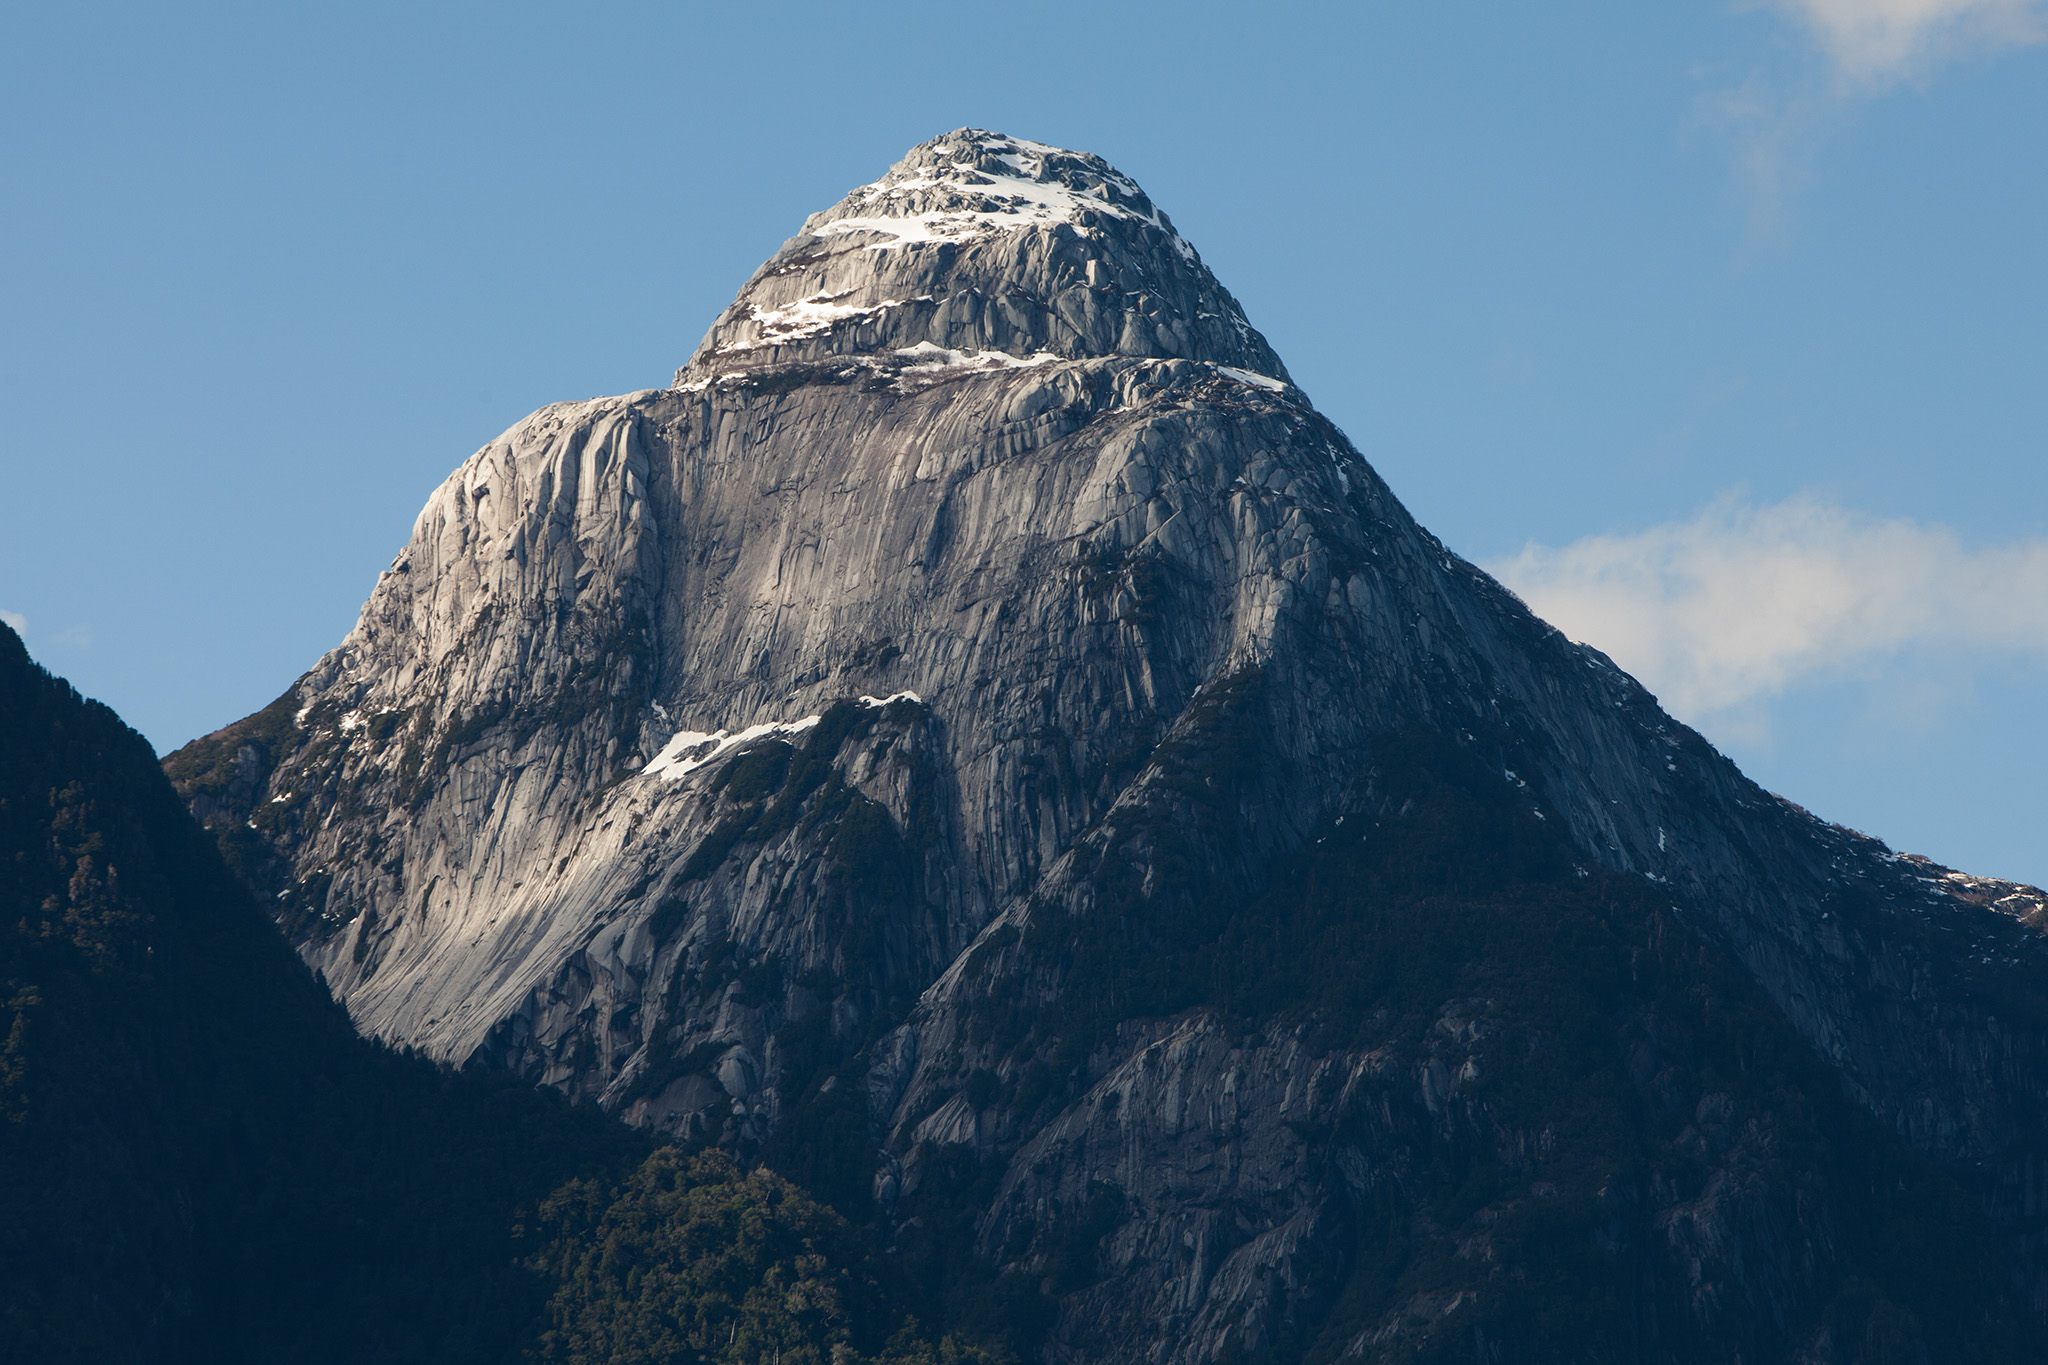 005-TW-Patagonia-140822.jpg